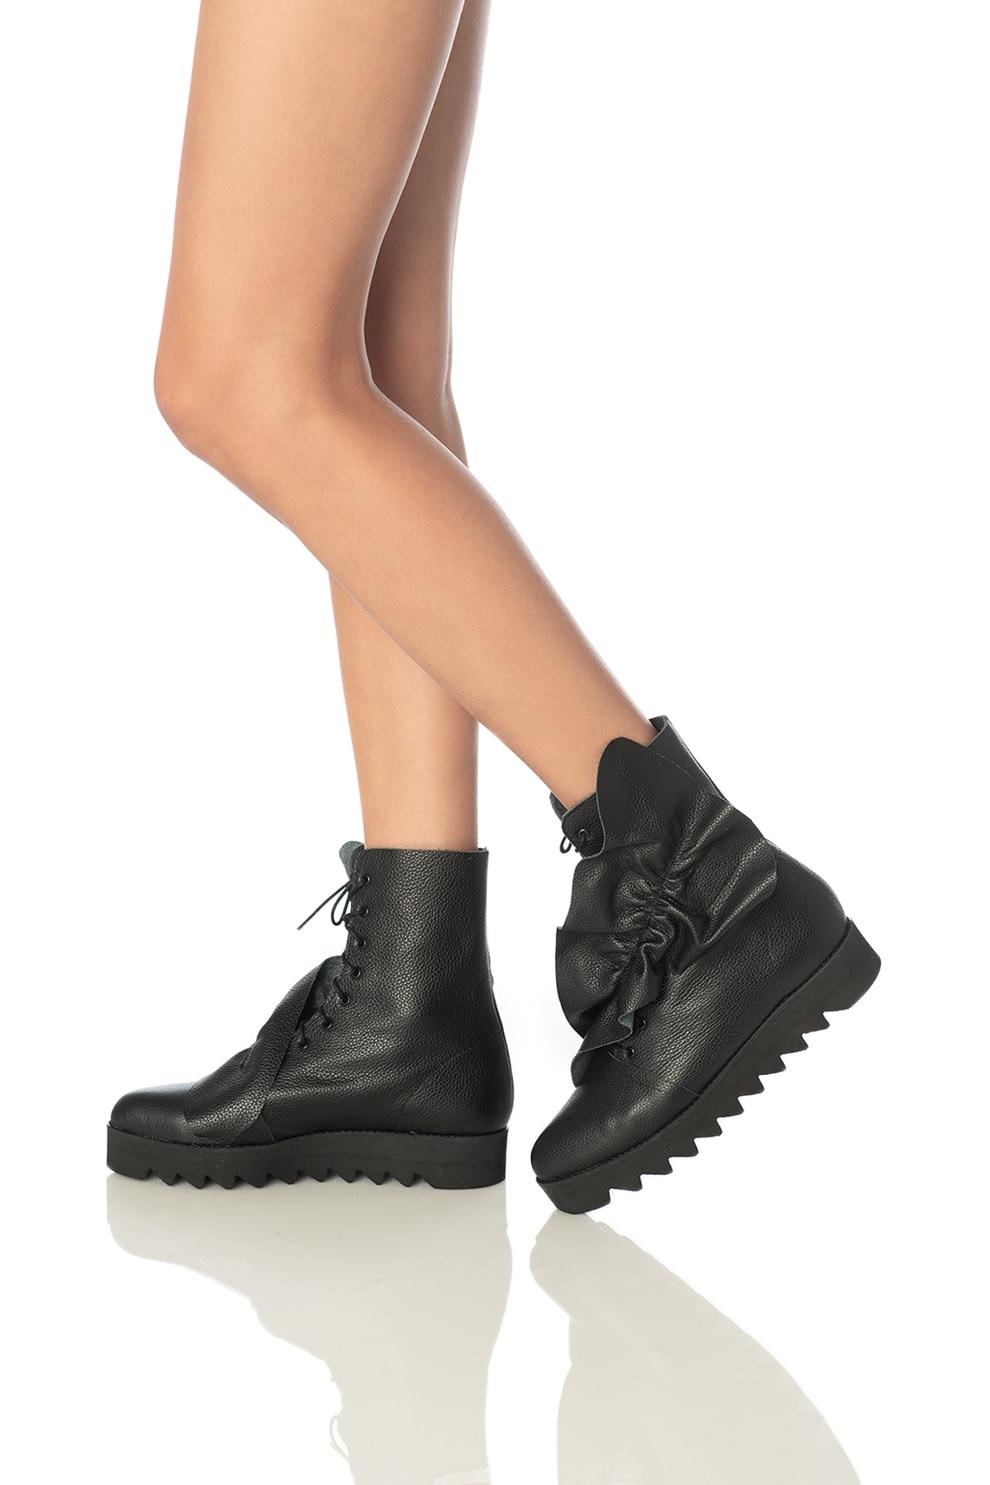 cumpărători de vânzări reducere ceas أهمية إهمال تزوير pantofi mihaela glavan online - sjvbca.org